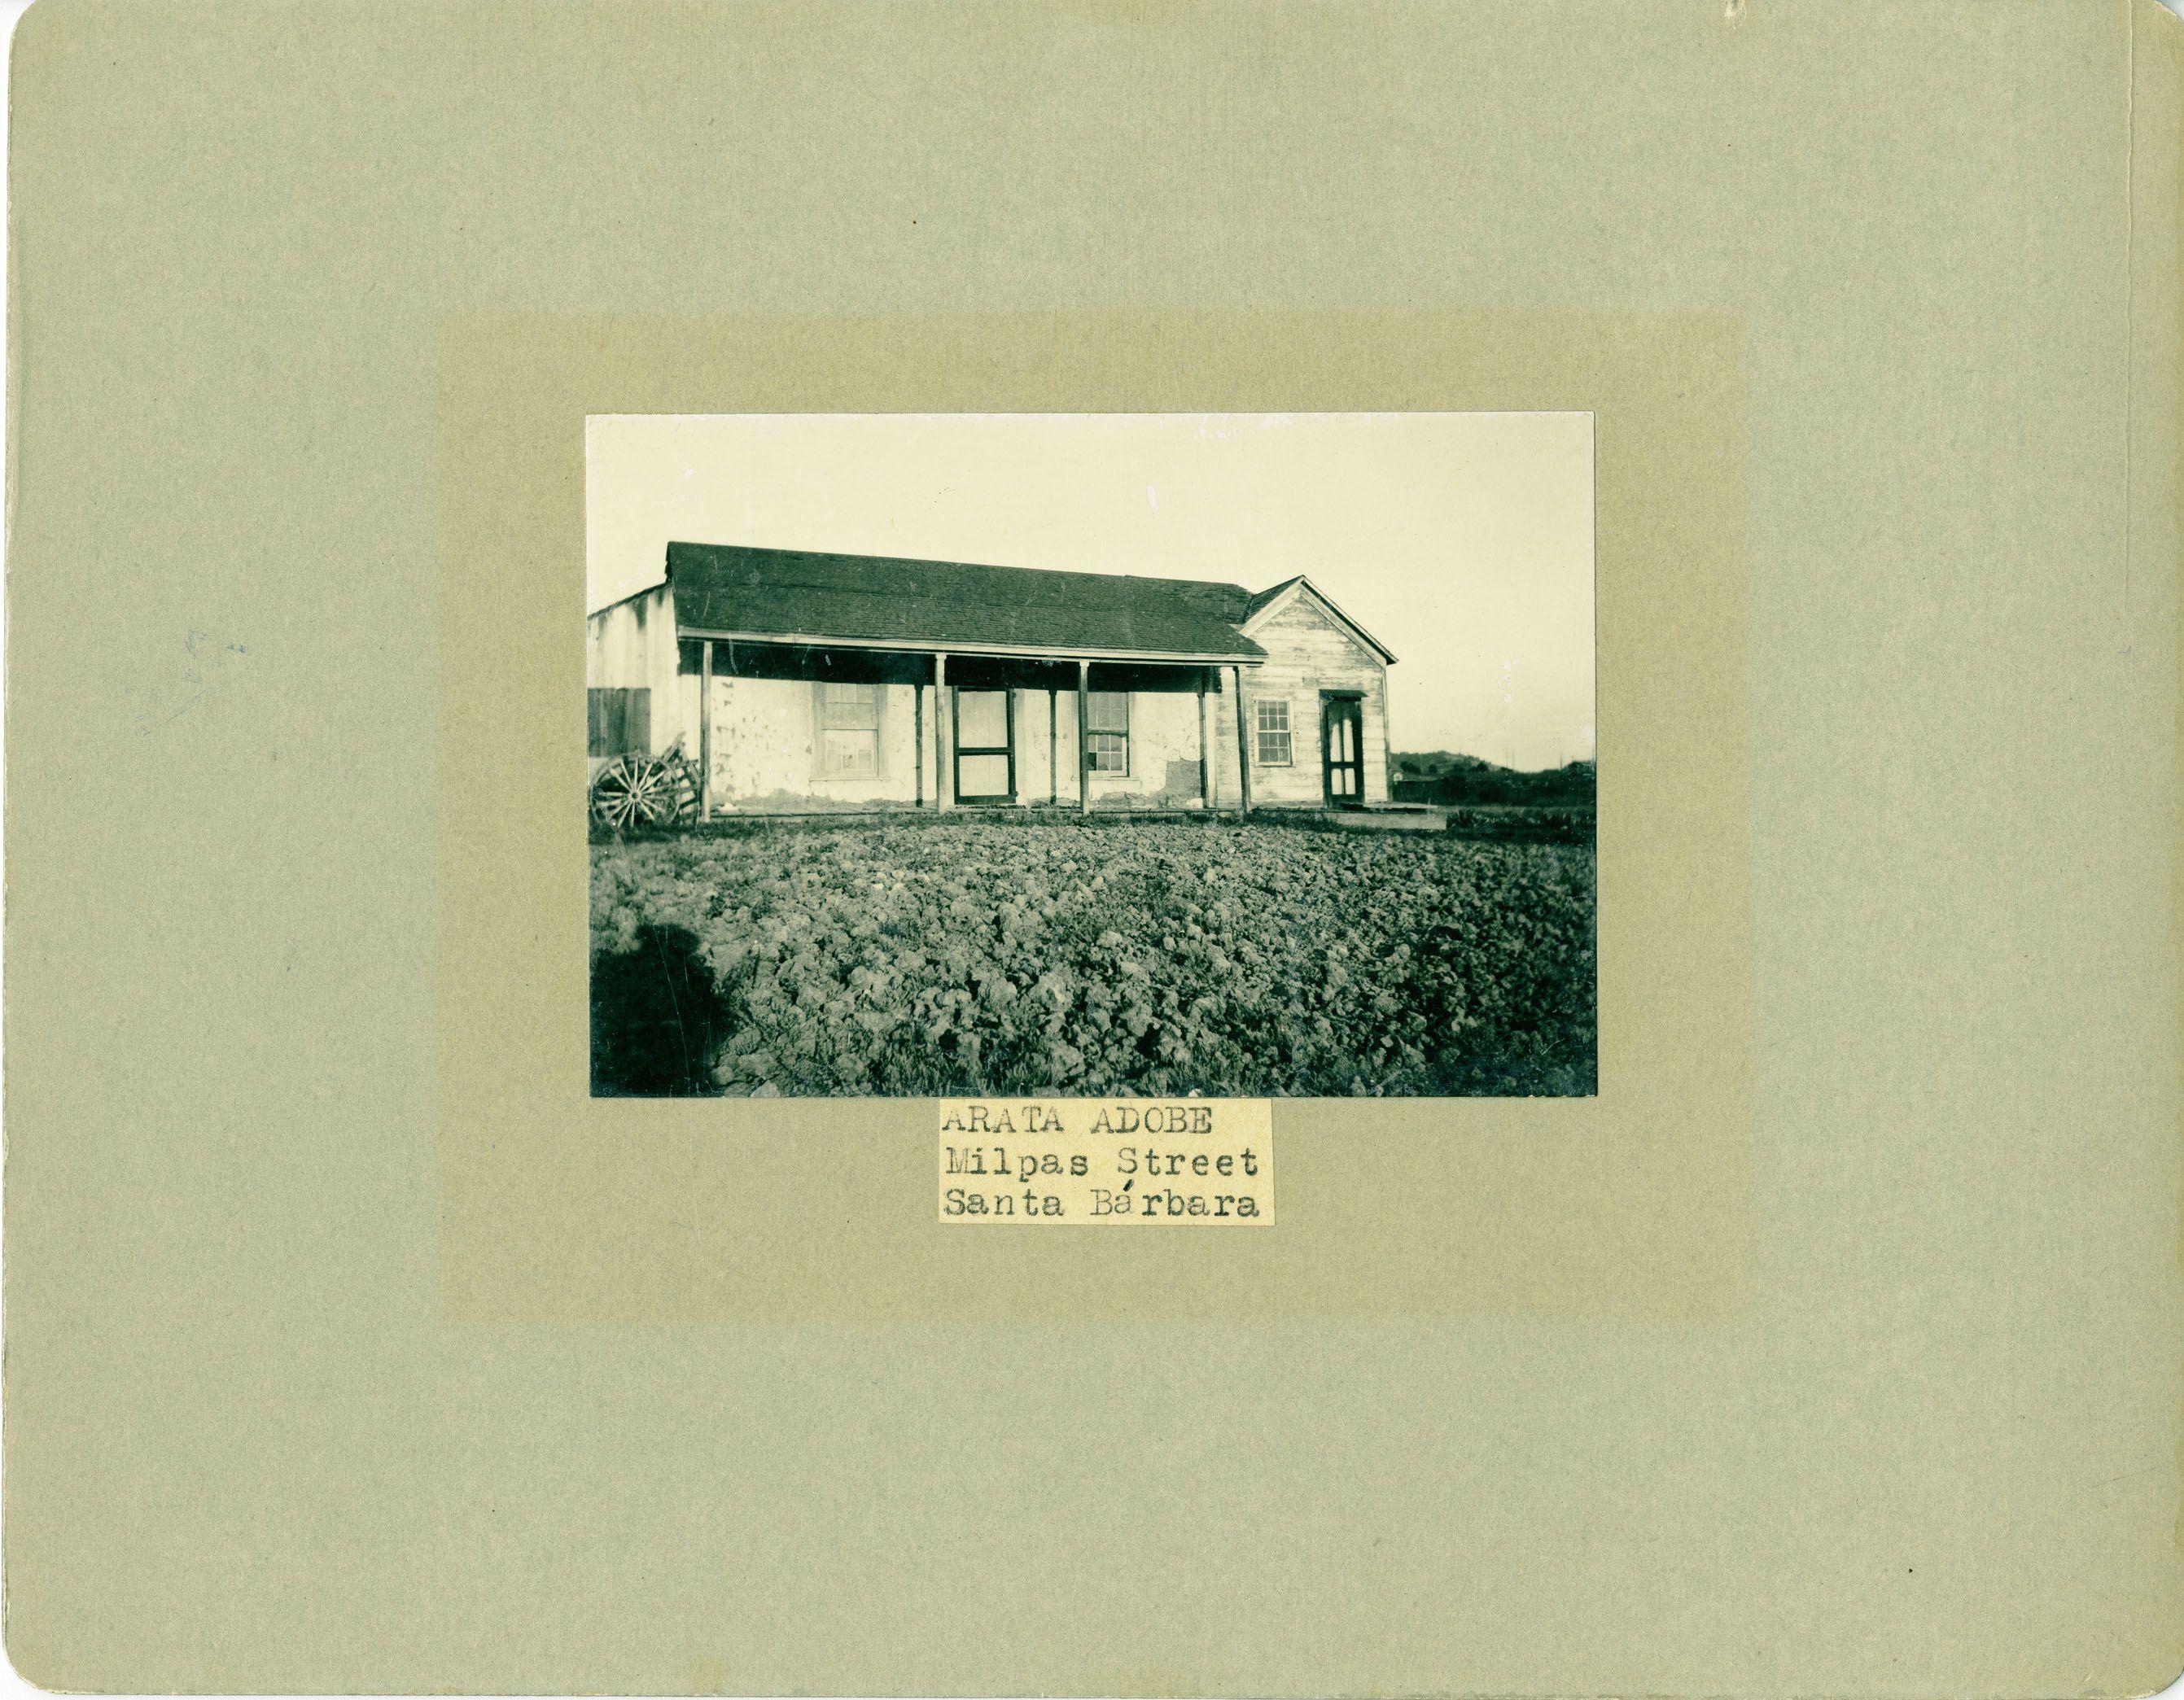 Full size image image black gold polaroid film